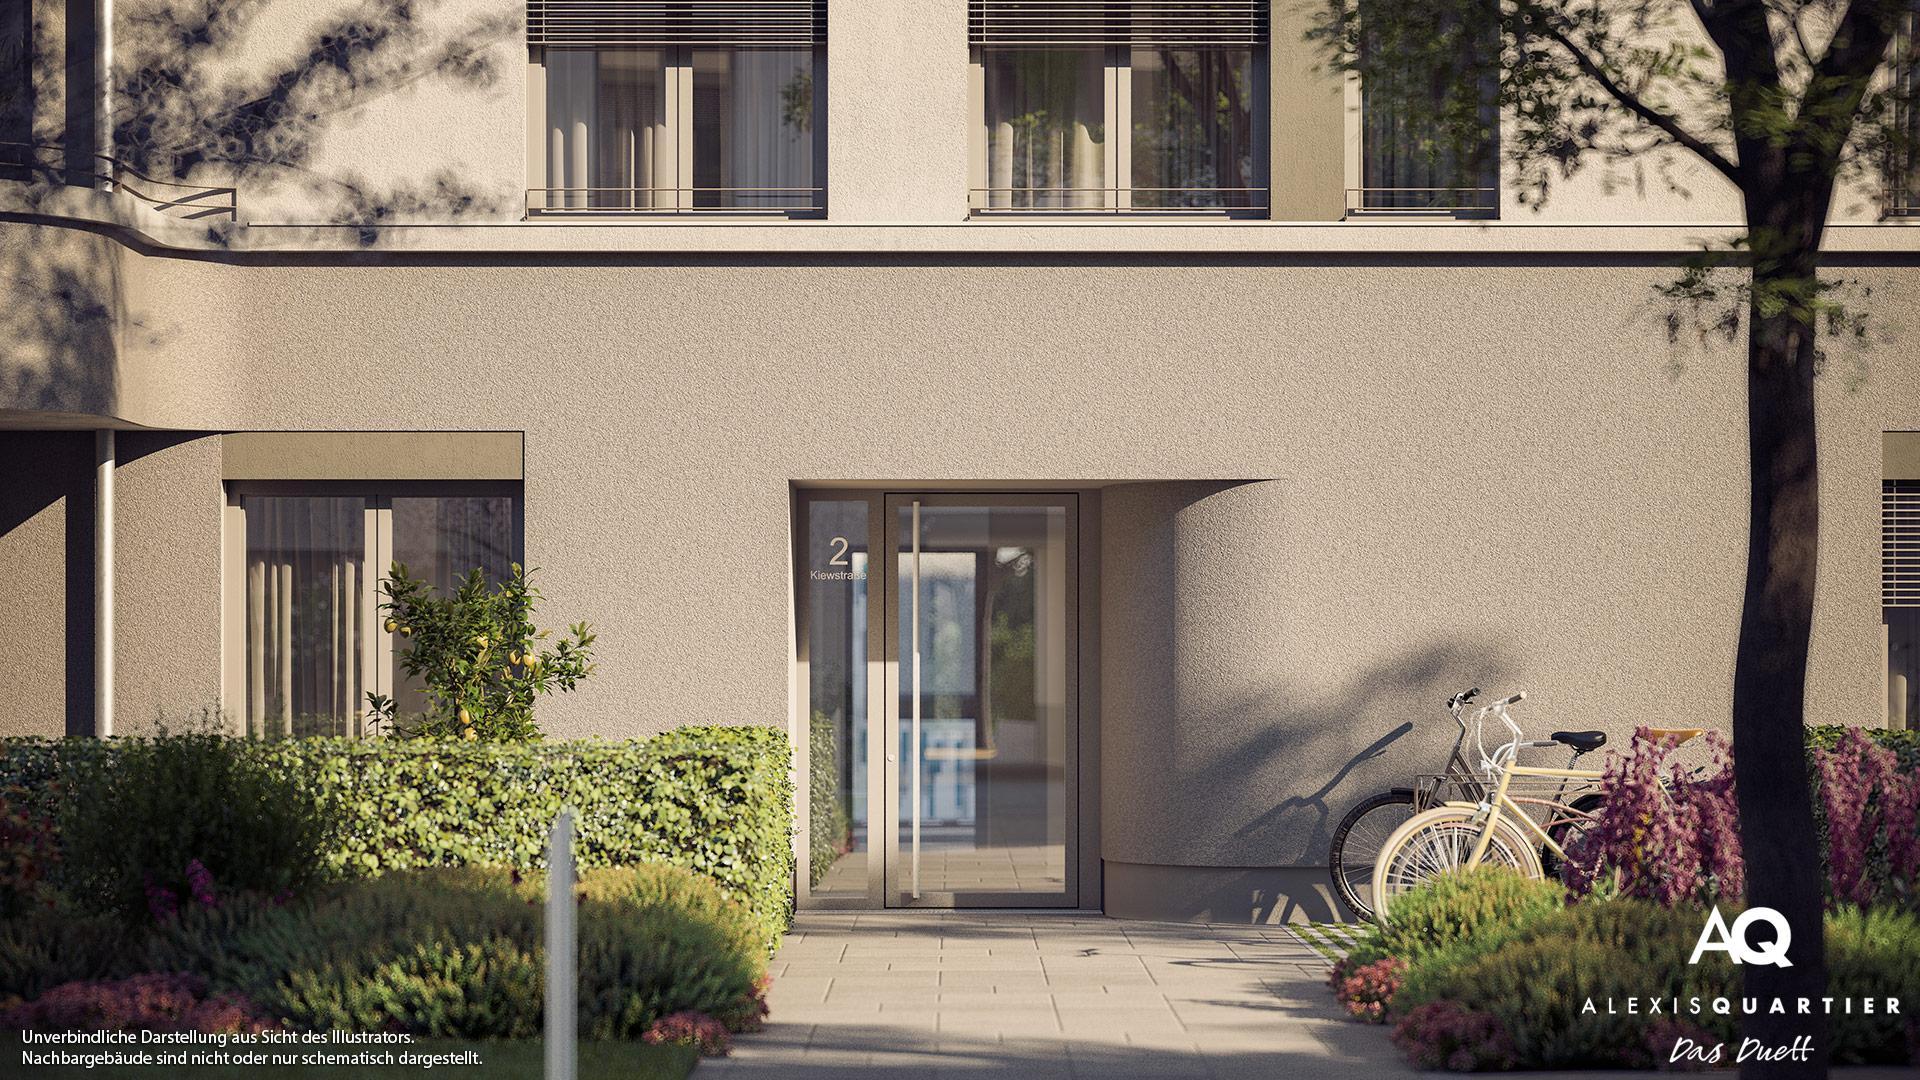 Immobilie Alexisquartier - Das Duett - Illustration 9